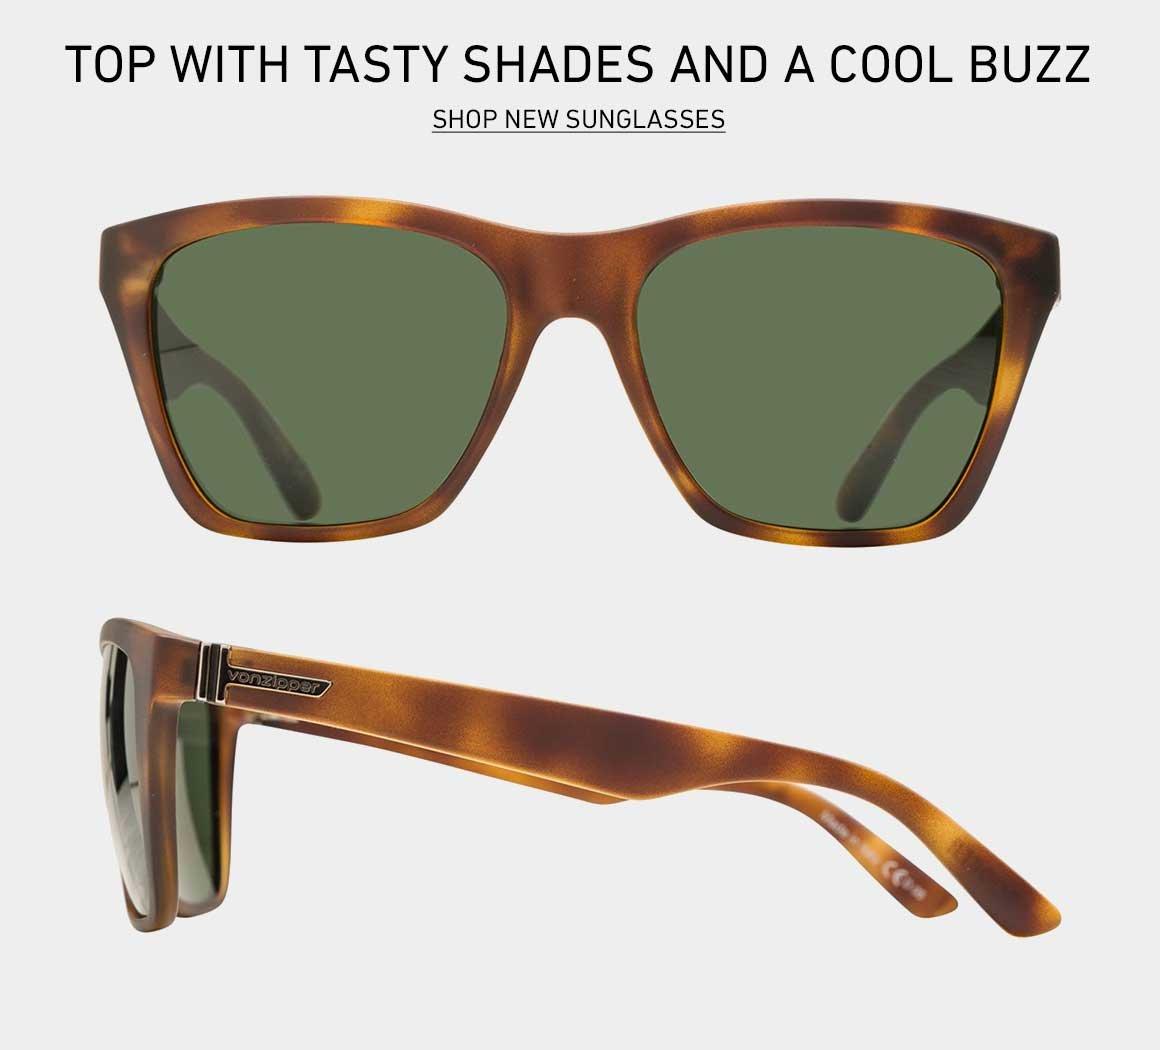 Shop New Sunglasses